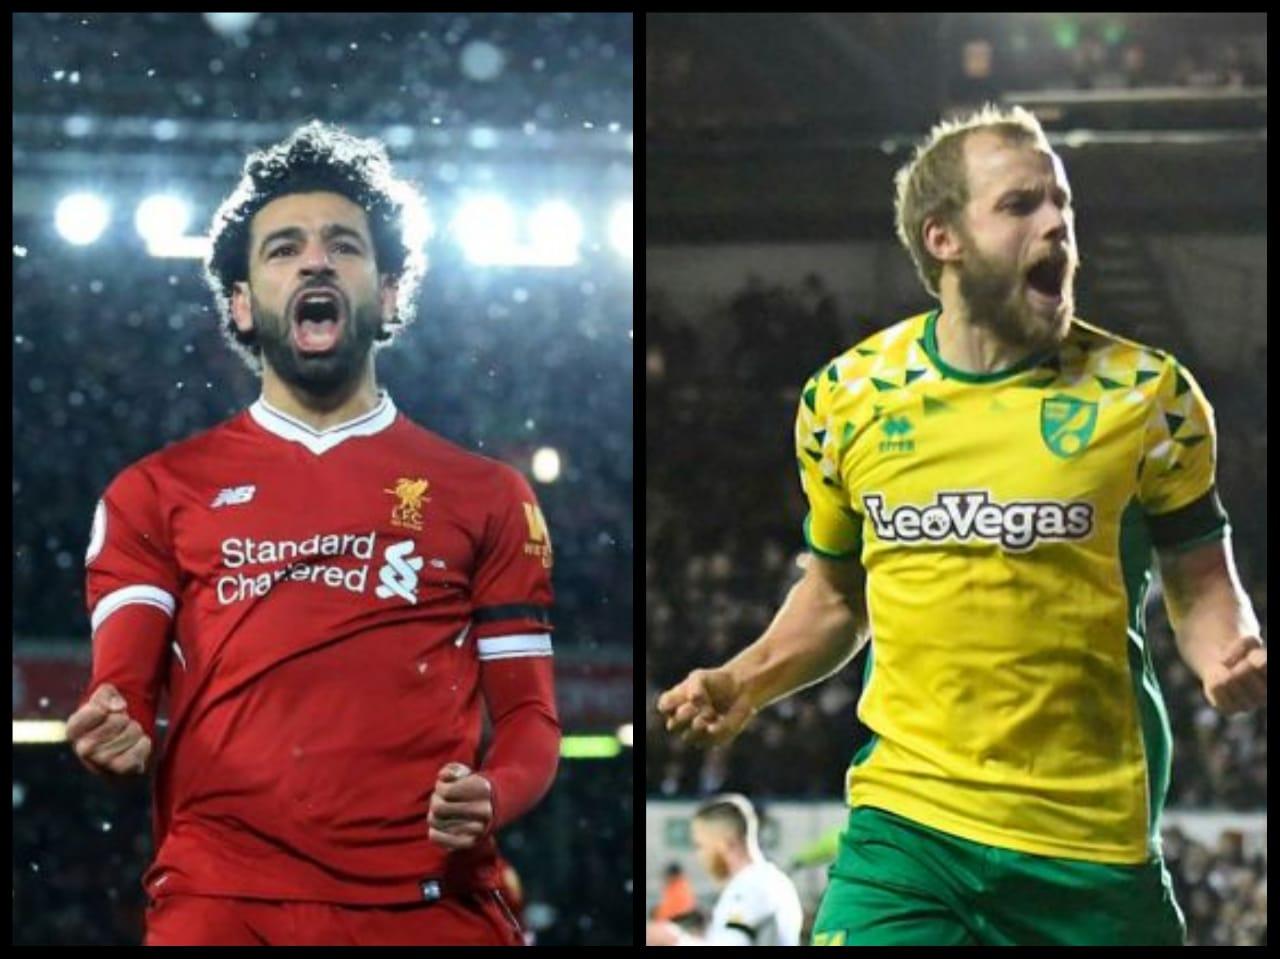 Liverpool vs Norwich City di laga pertama Liga Inggris musim ini. Siapa lebih unggul? (Foto : Istimewa)